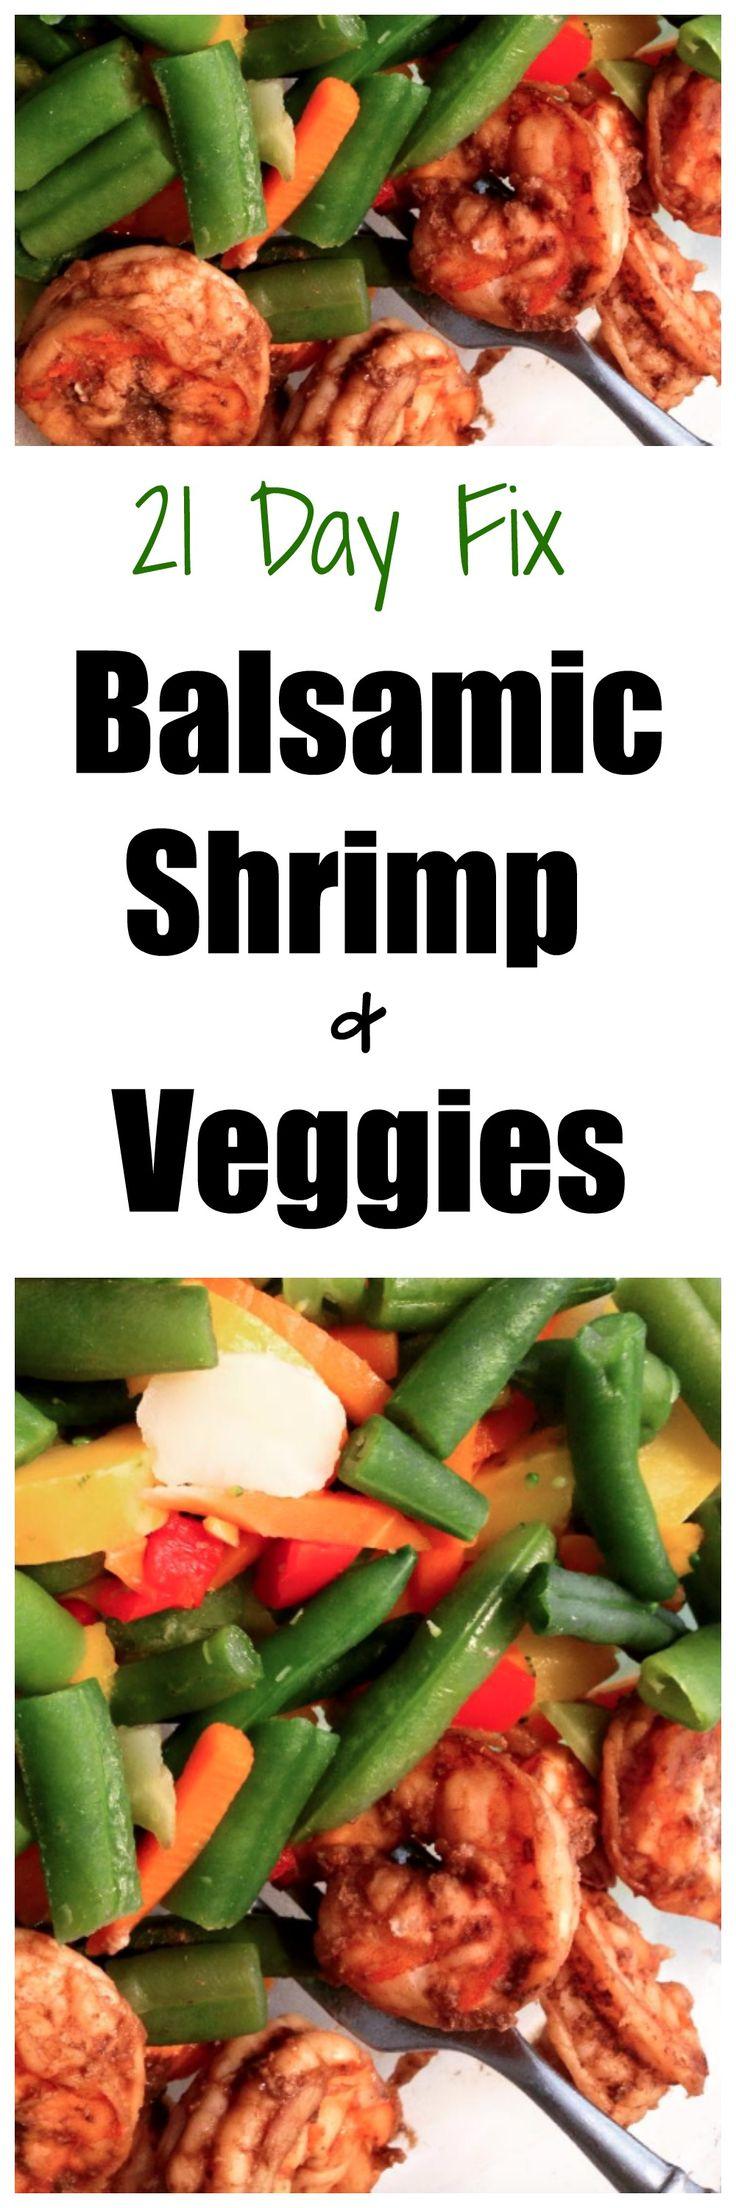 21 Day Fix Balsamic Shrimp and Veggies #21dayfix #21dayfixrecipes #21dfxrecipes #21dfx #cleaneatingrecipes #cleaneating